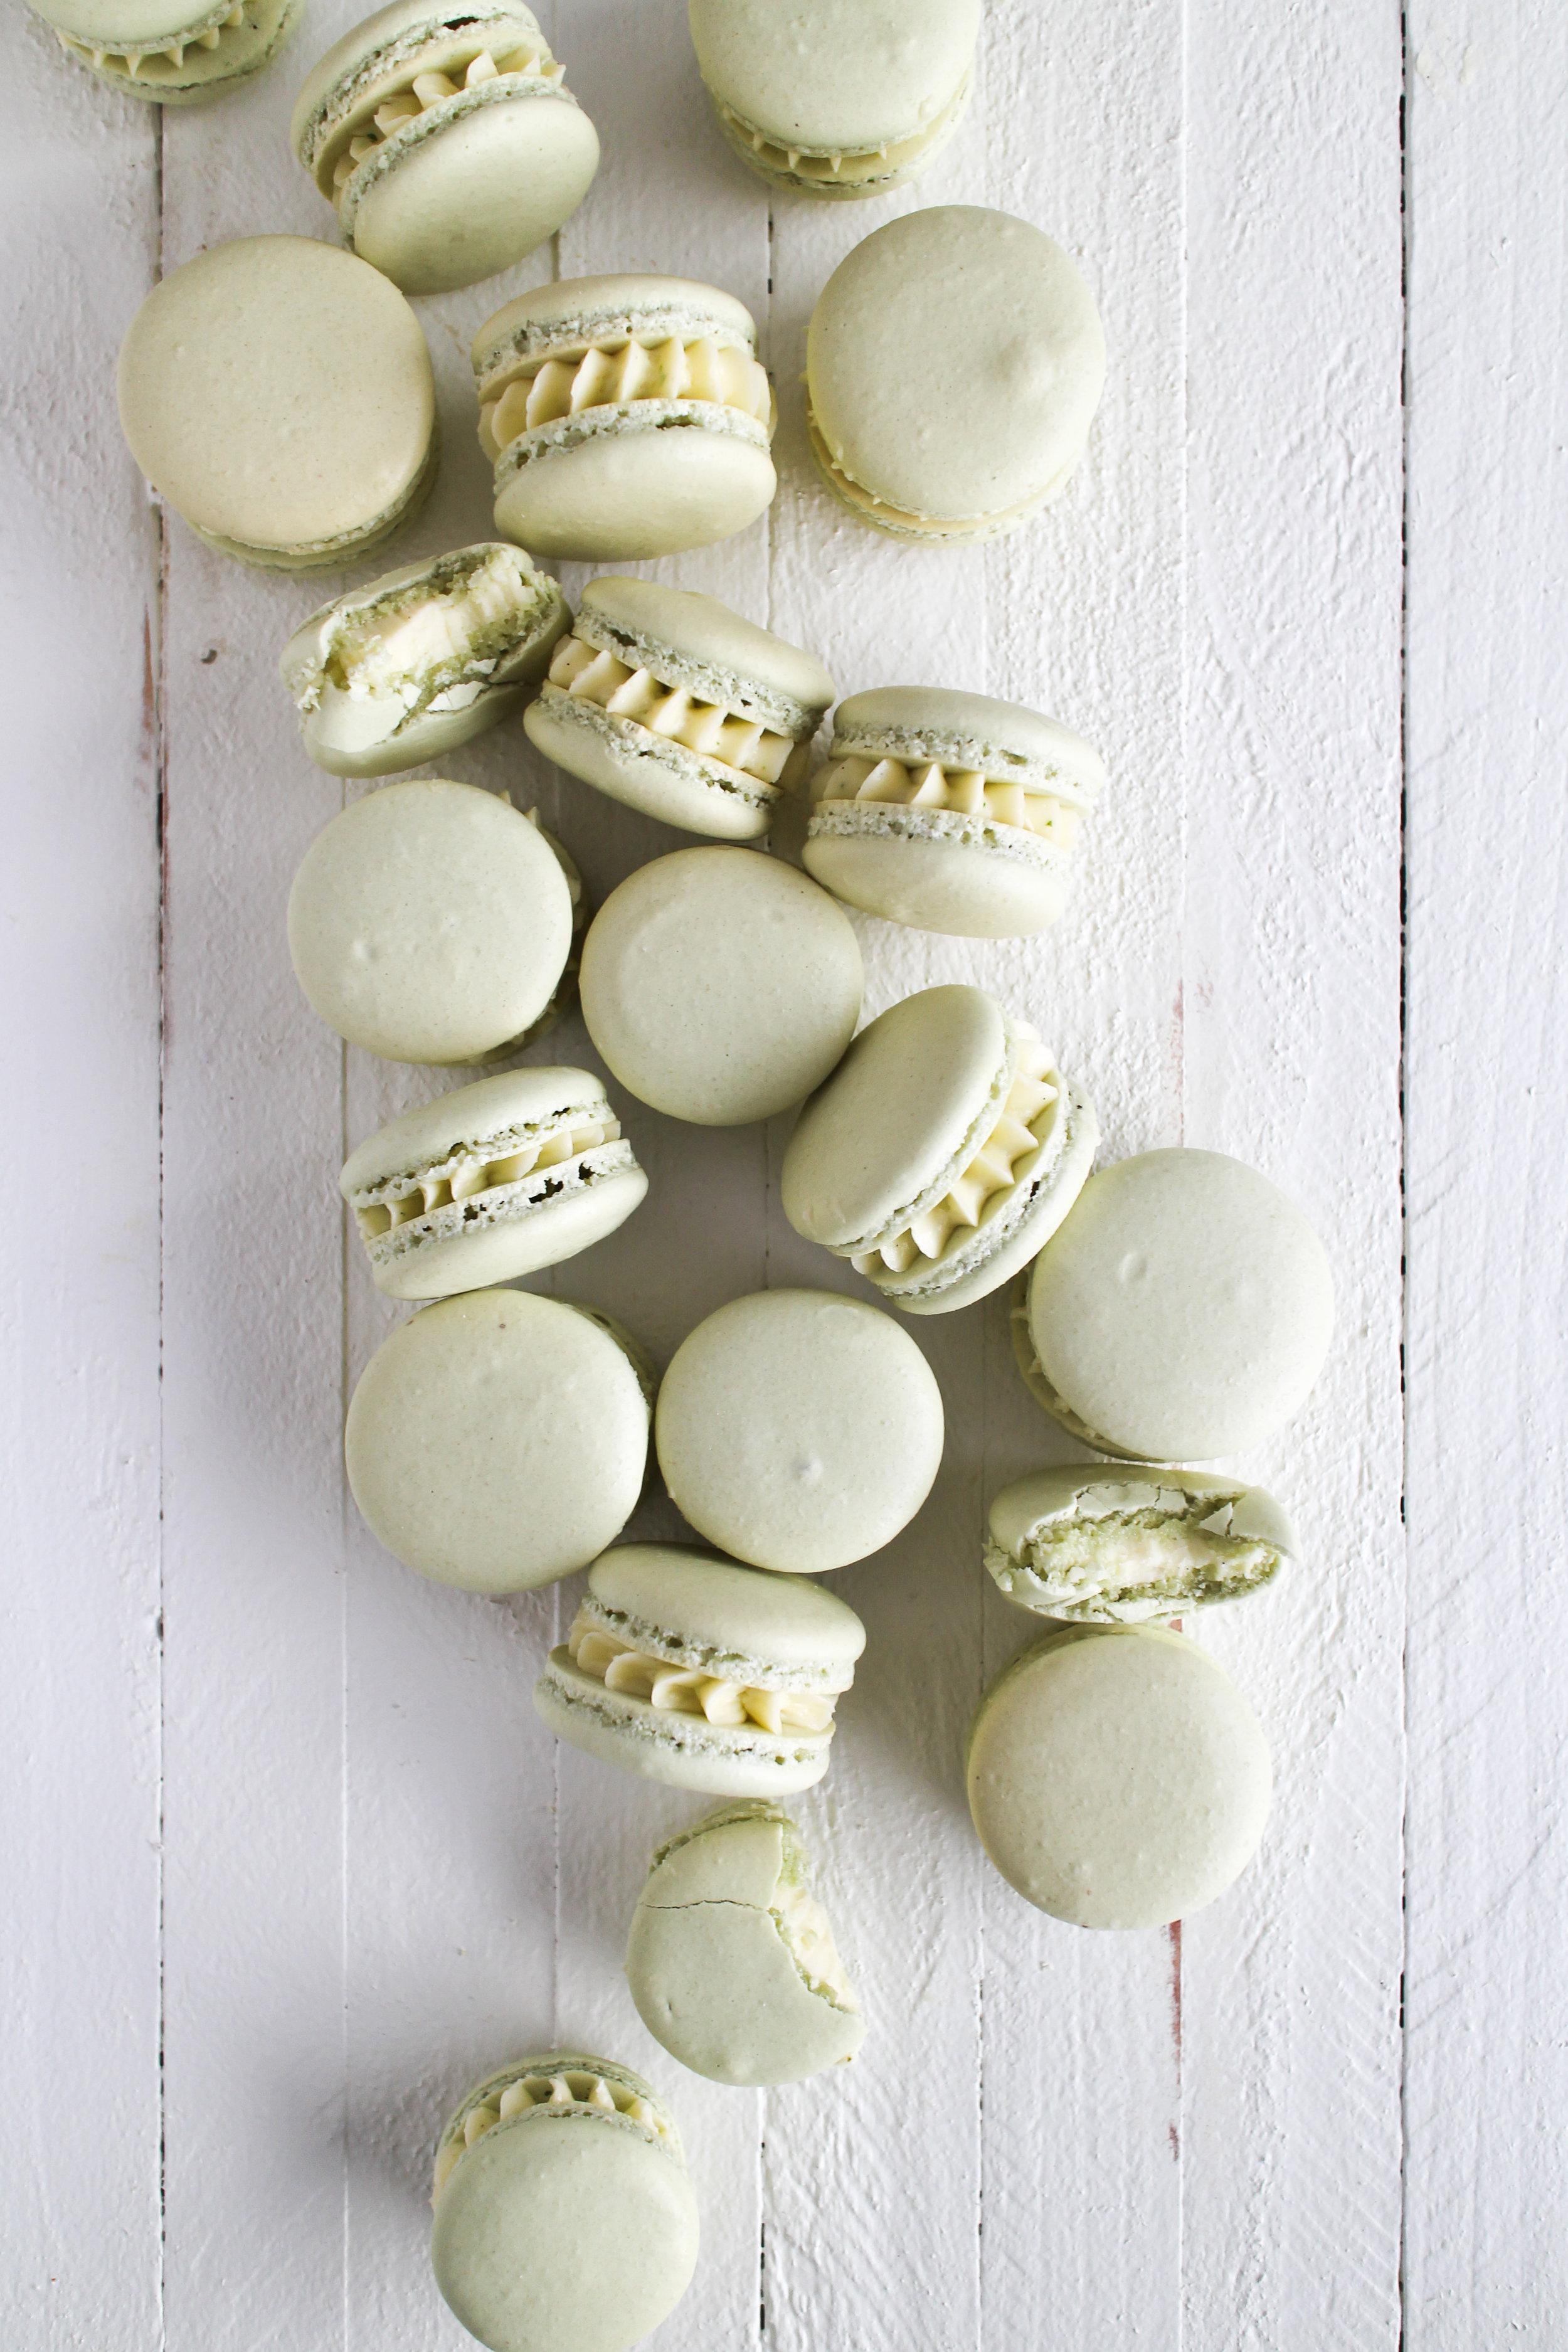 Kaffir Lime Macarons - classic vanilla shell with kaffir lime infused german buttercream by Fox and Crane